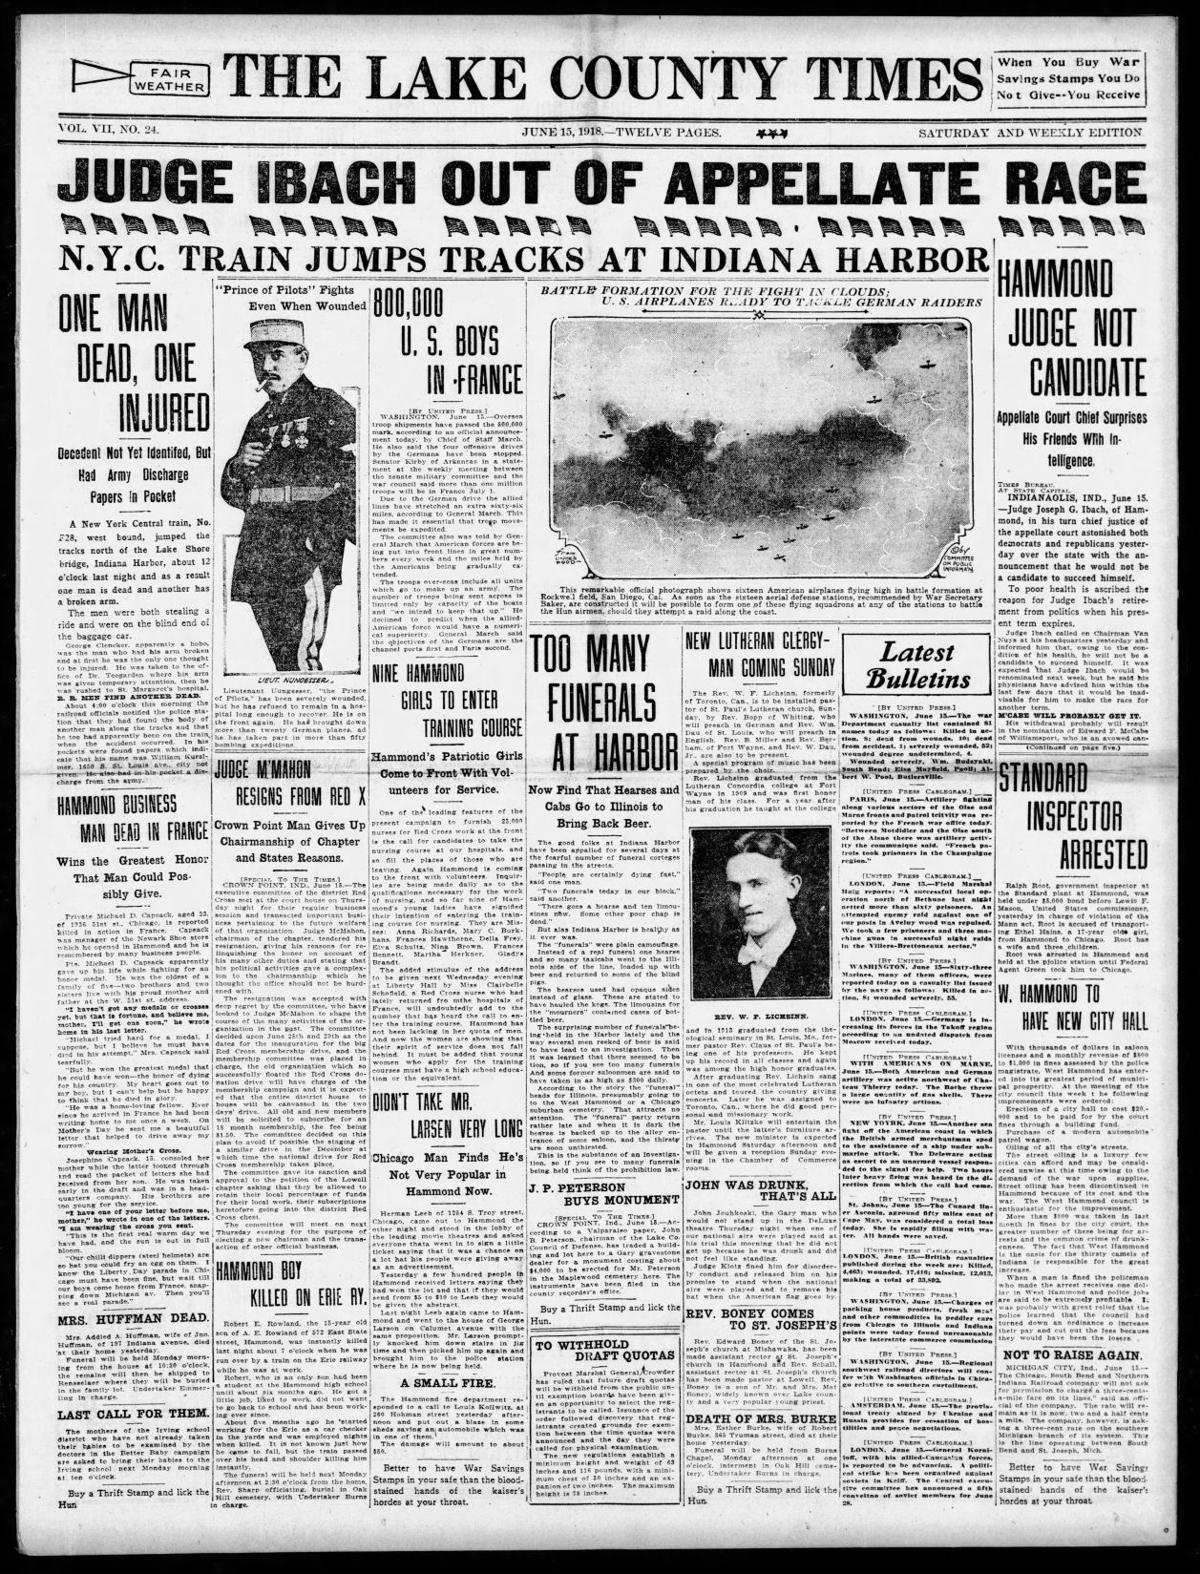 June 15, 1918: N.Y.C. Train Jumps Tracks At Indiana Harbor